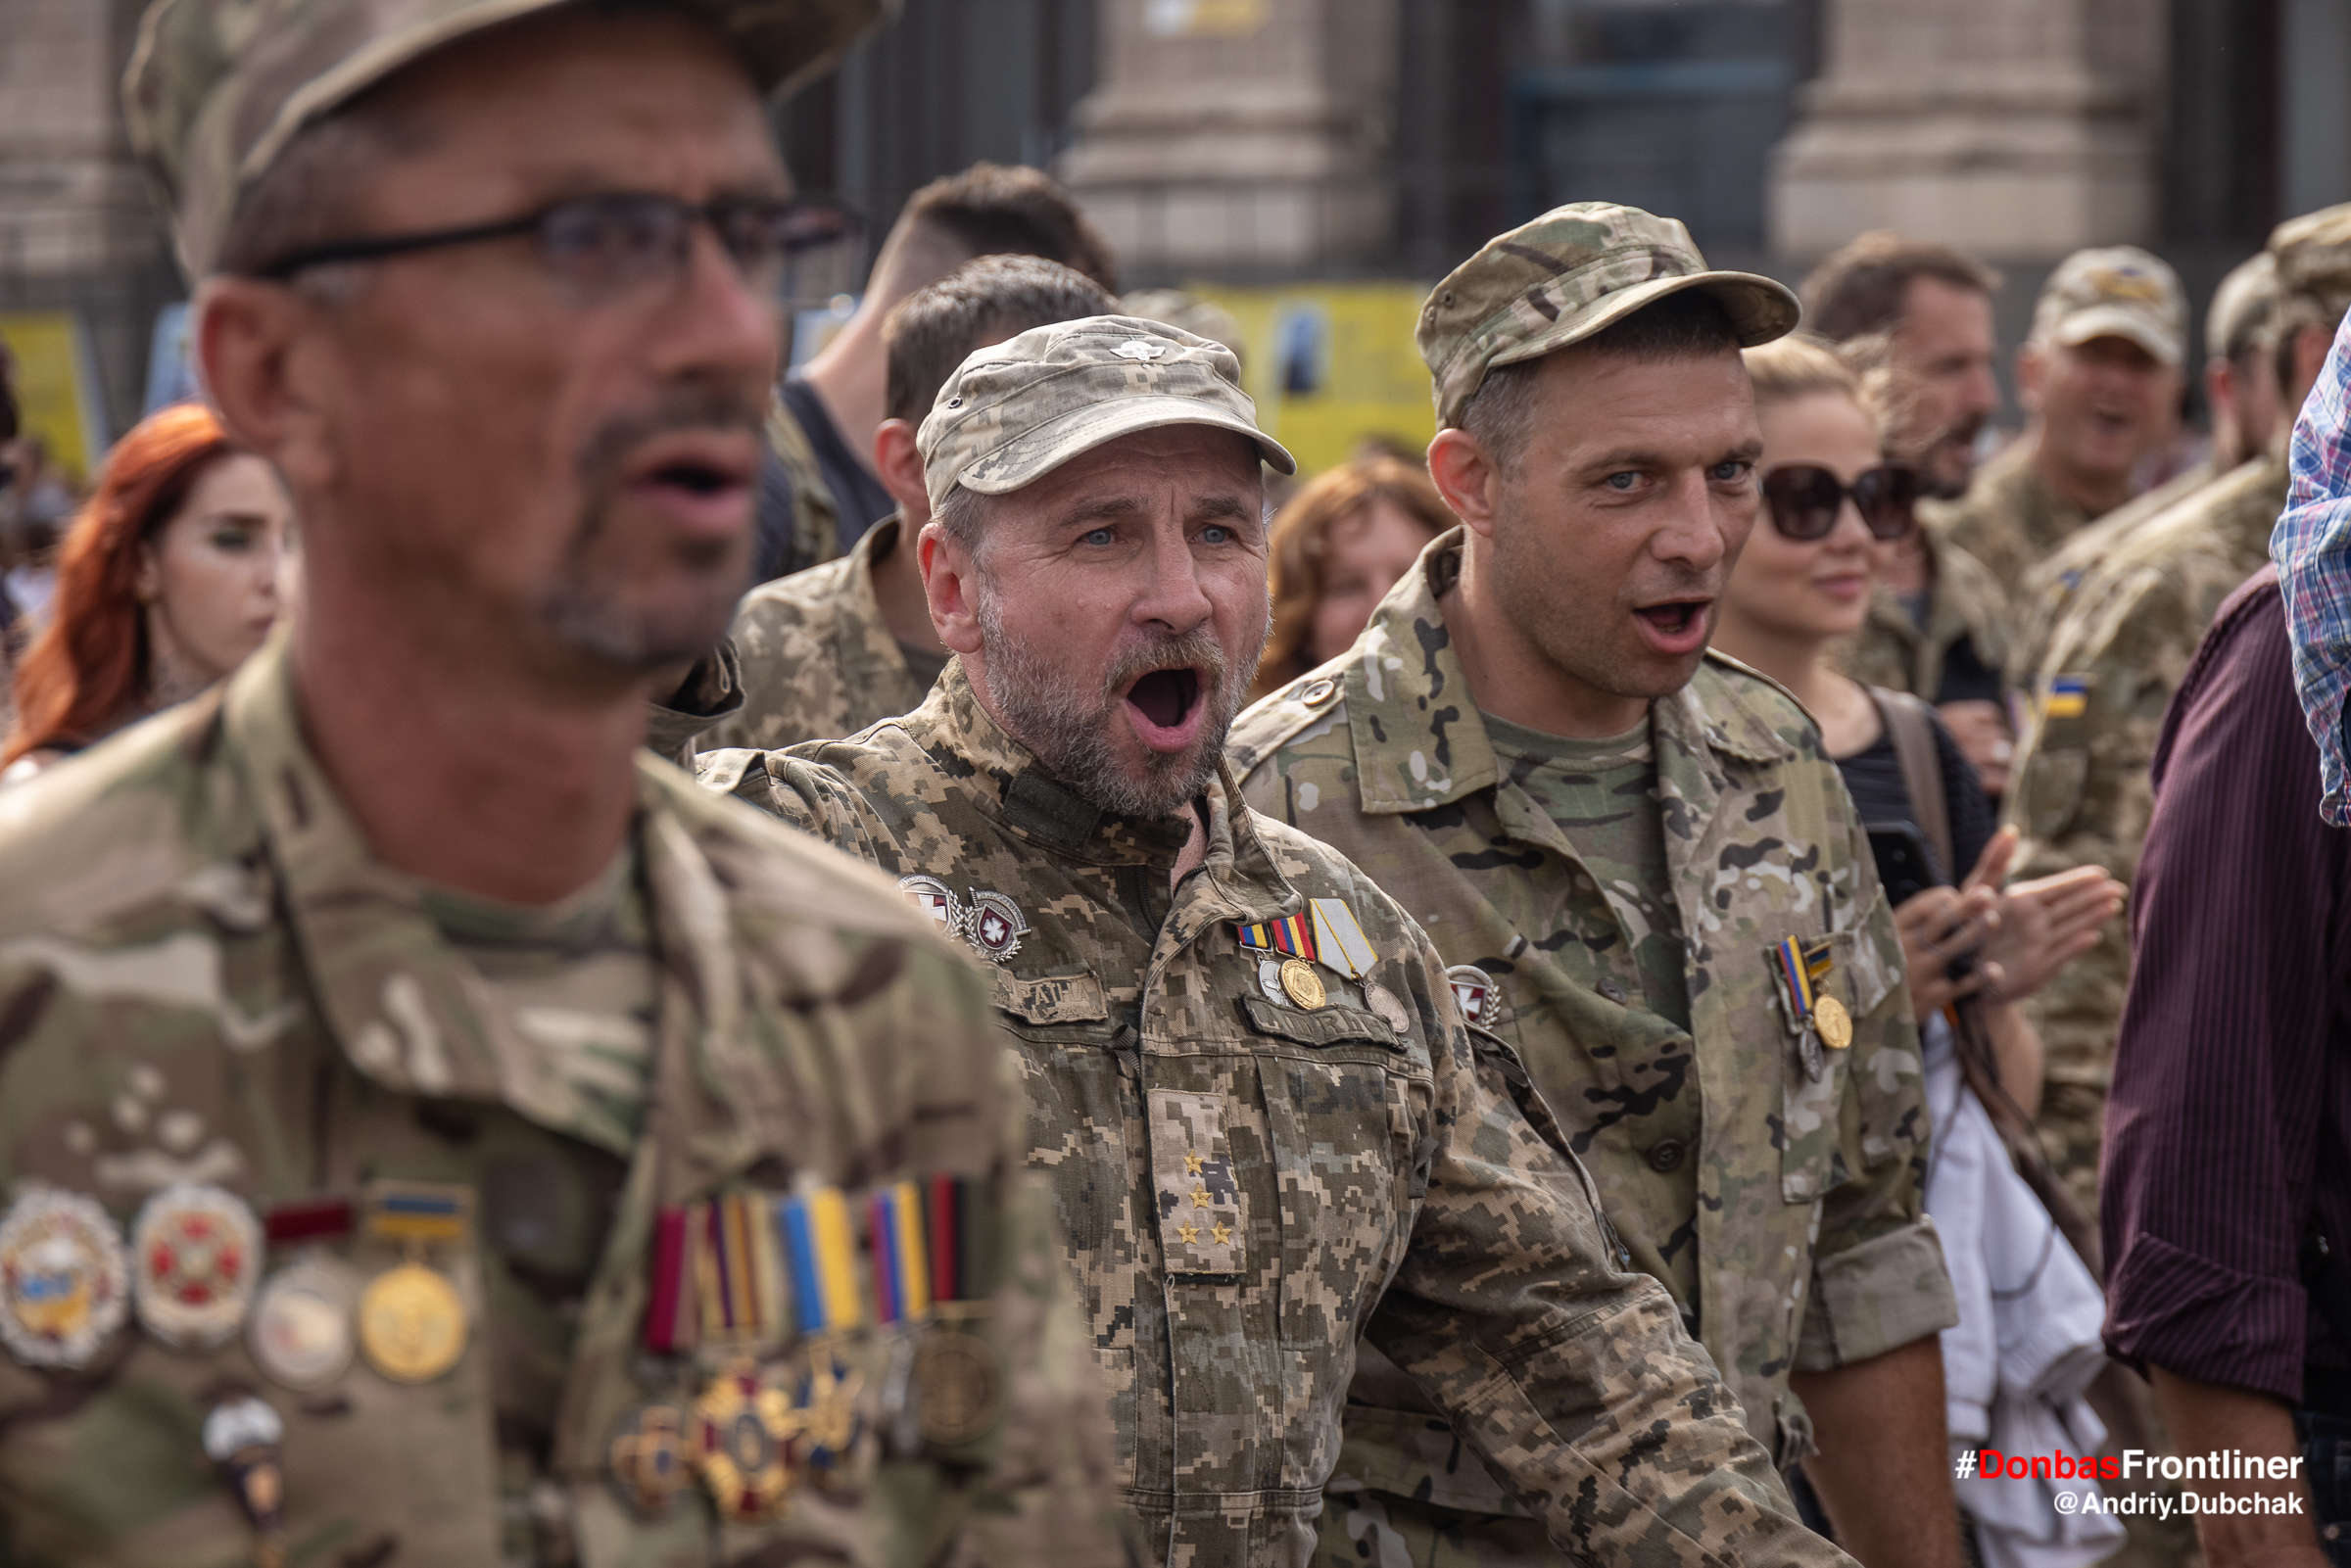 Donbas Frontliner фото - марш ветеранів 2021, доброволеці